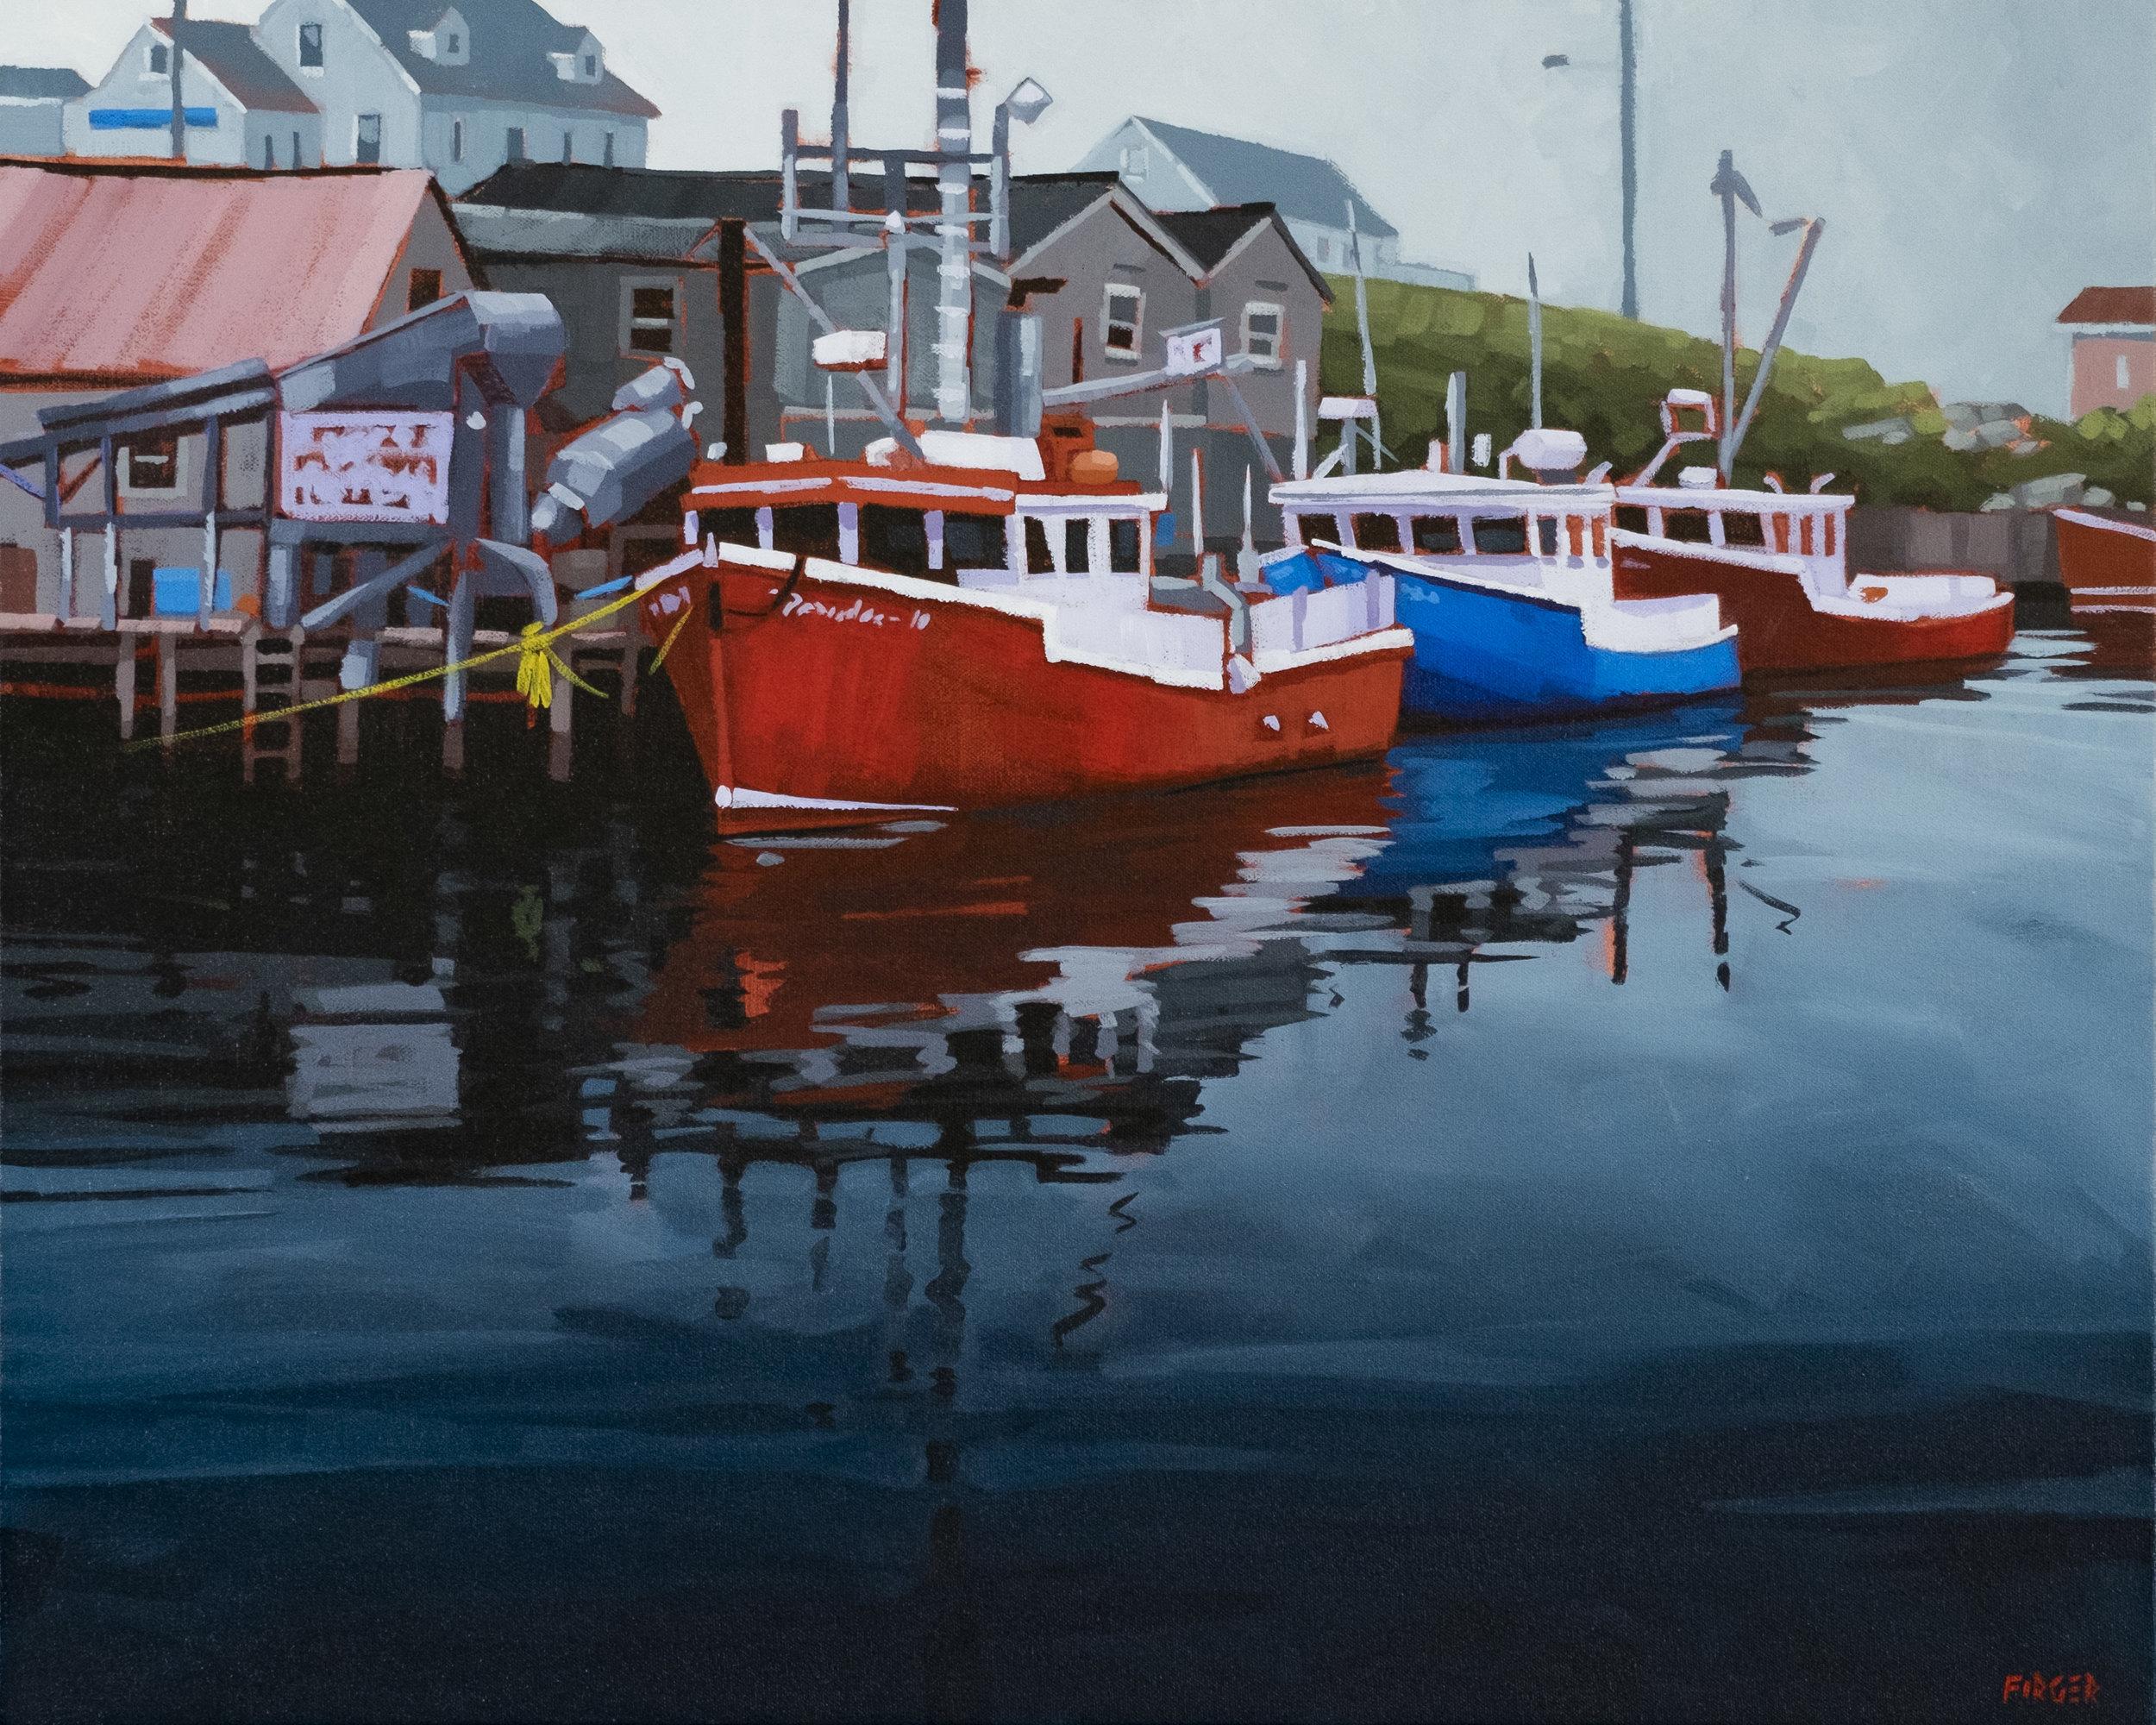 The Line Up (Nova Scotia) - 24 x 30, Acrylic on Canvas